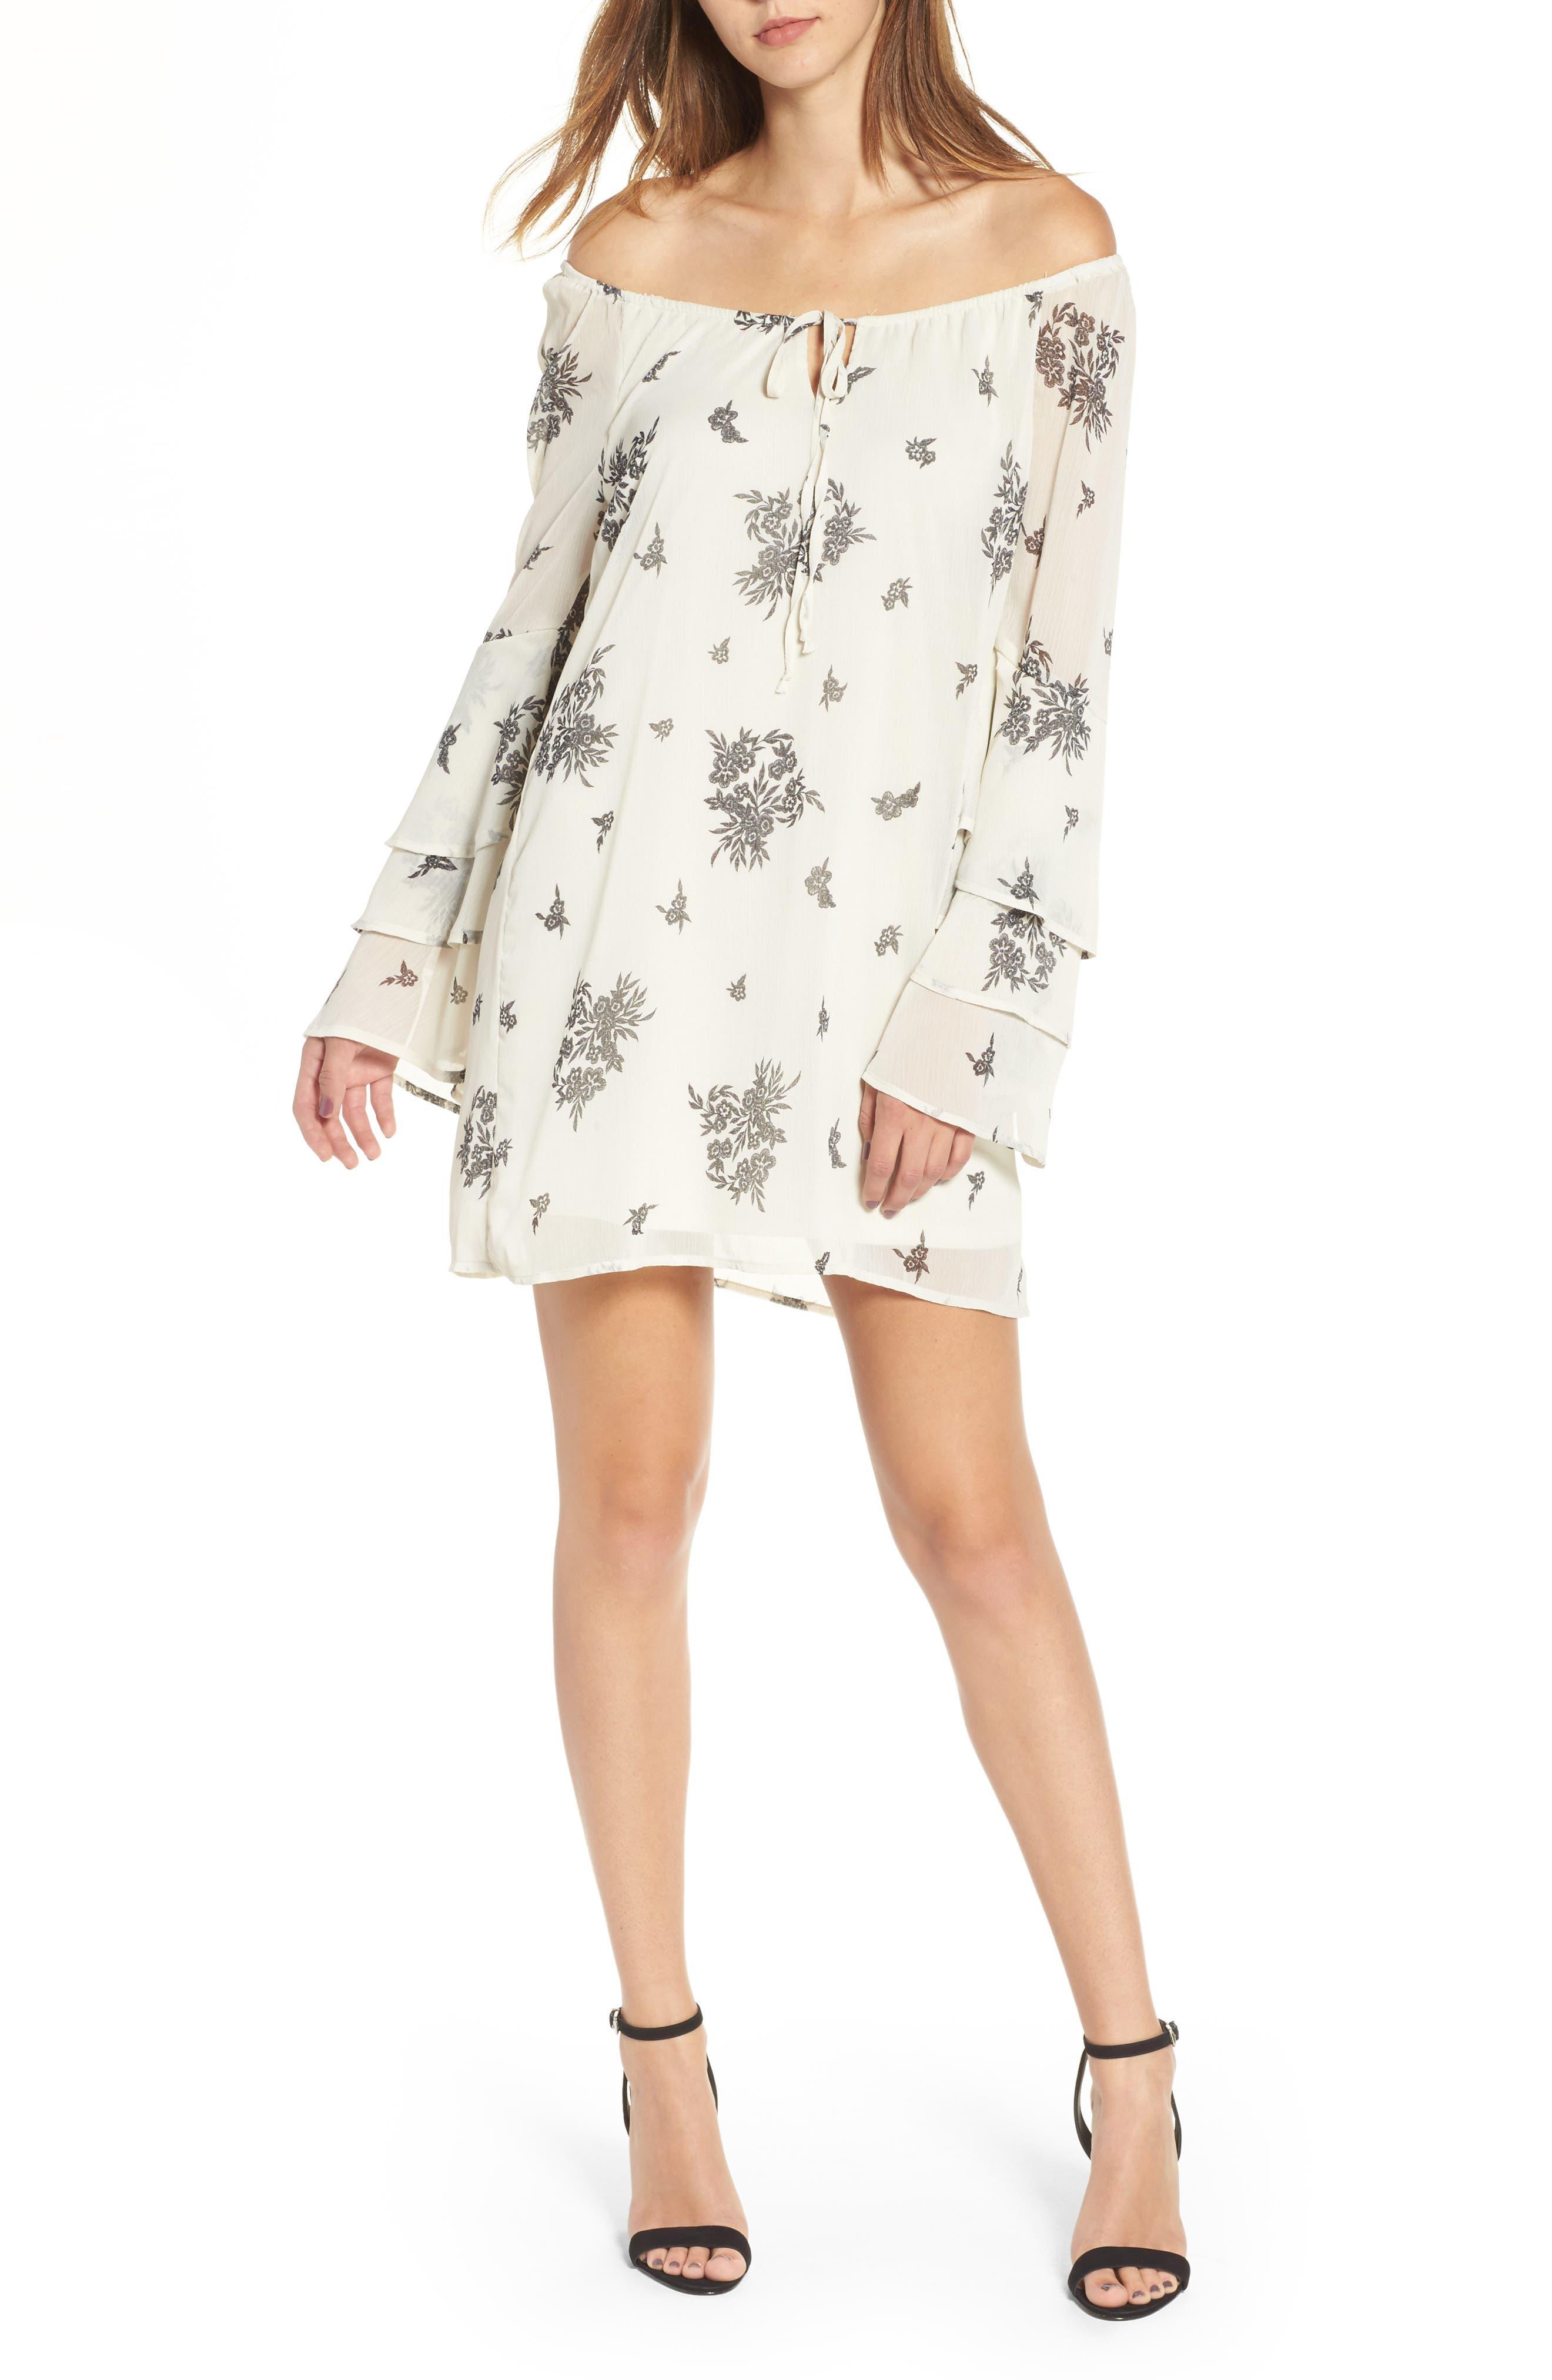 Ruffle Sleeve Dress,                             Main thumbnail 1, color,                             Cream/ Black